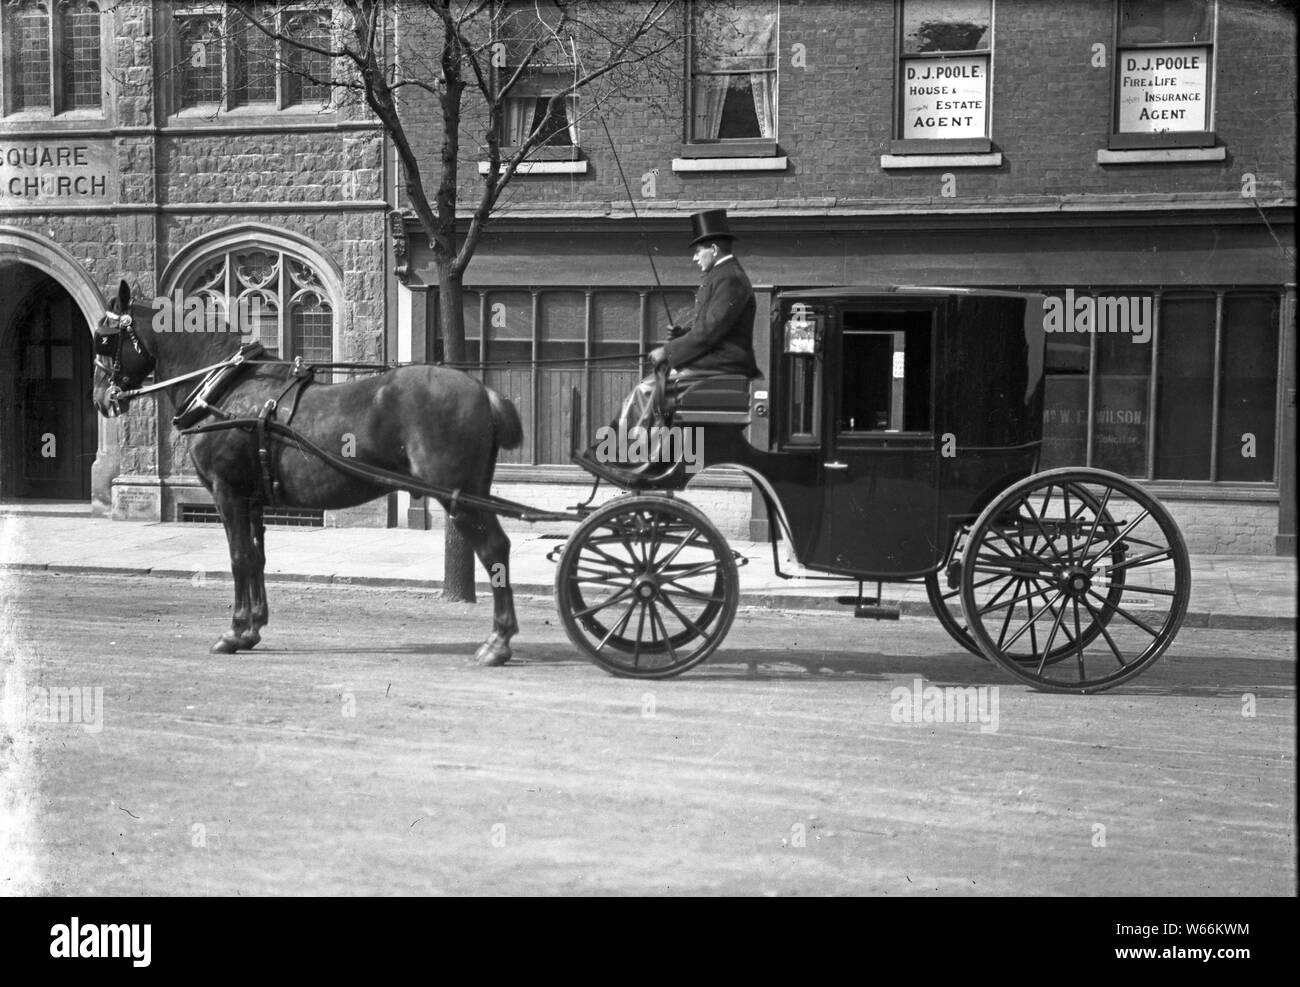 UK - GB Pferdewagen mit Kutscher / United Kingdom - Great Britain Horse Carriage with Coachman Stock Photo